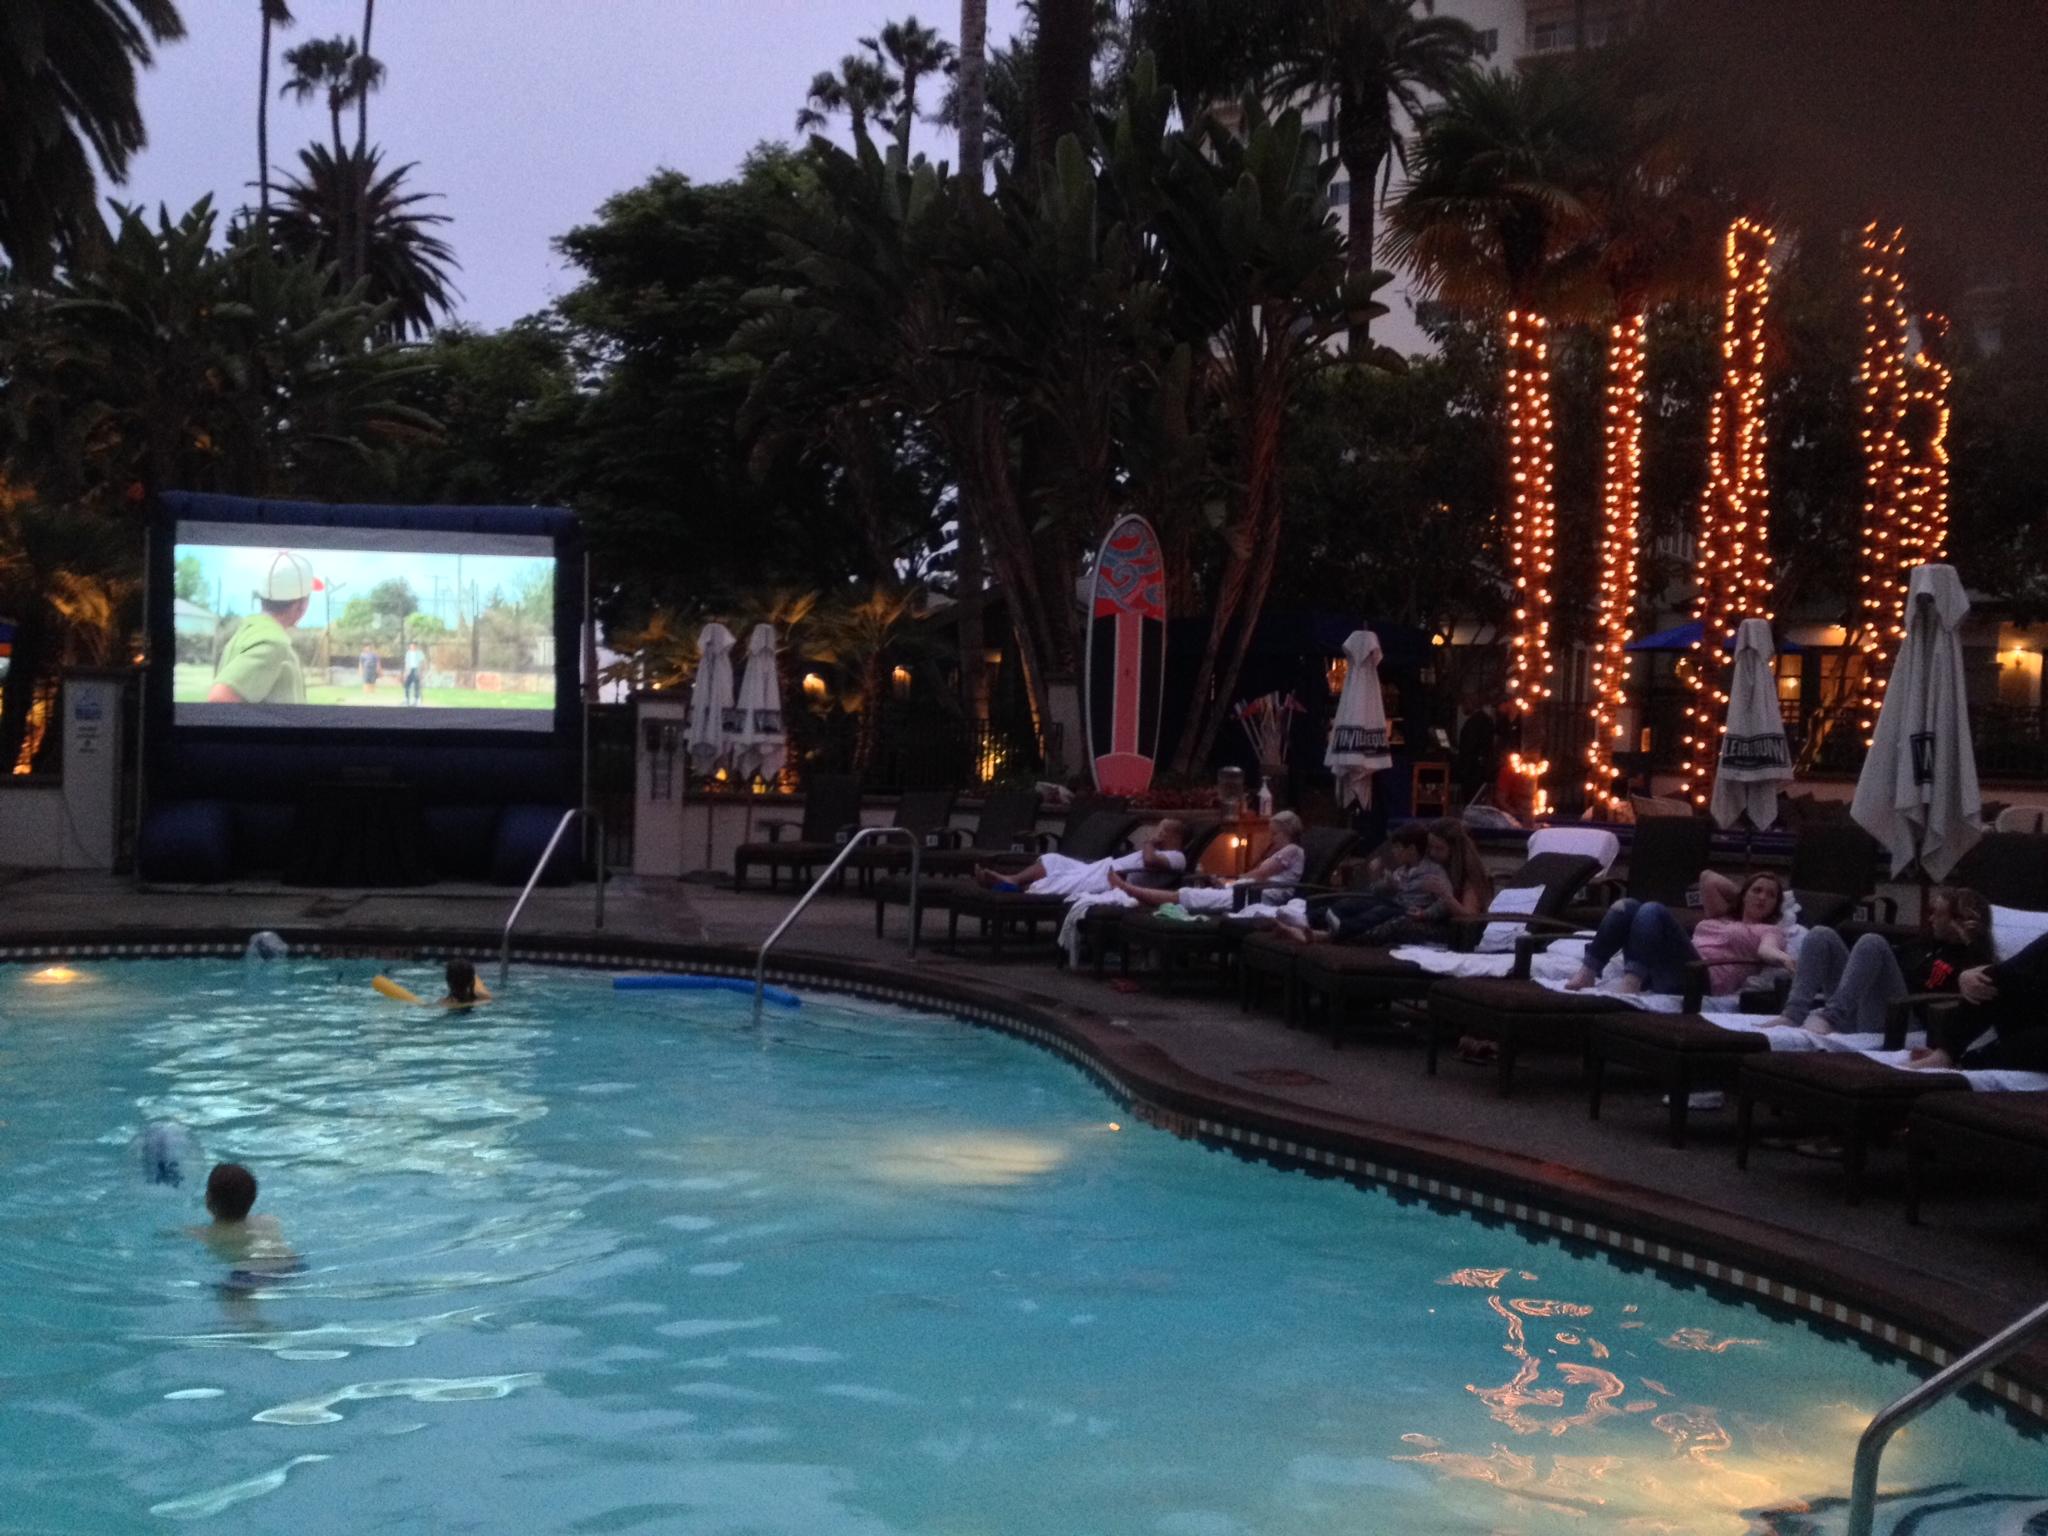 Starry Night Poolside Cinema At The Miramar Pool Club